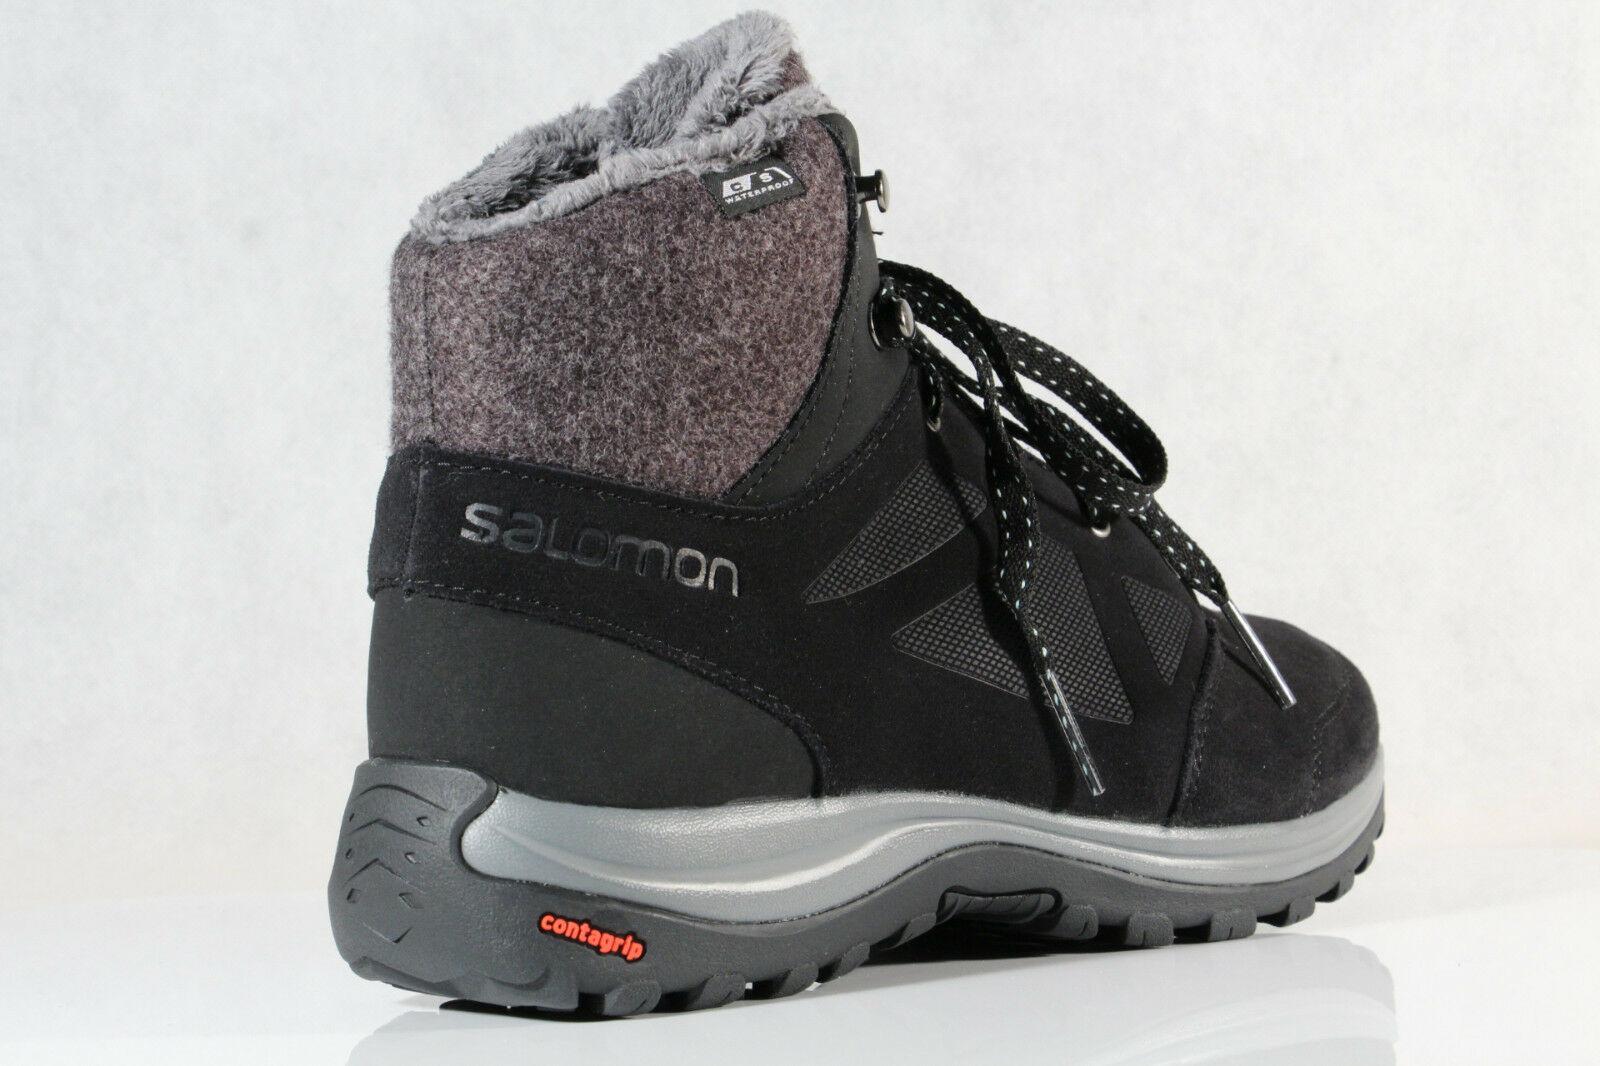 Salomon Ellipse Freeze CS WP Stiefel 406132 Boots schwarz CS